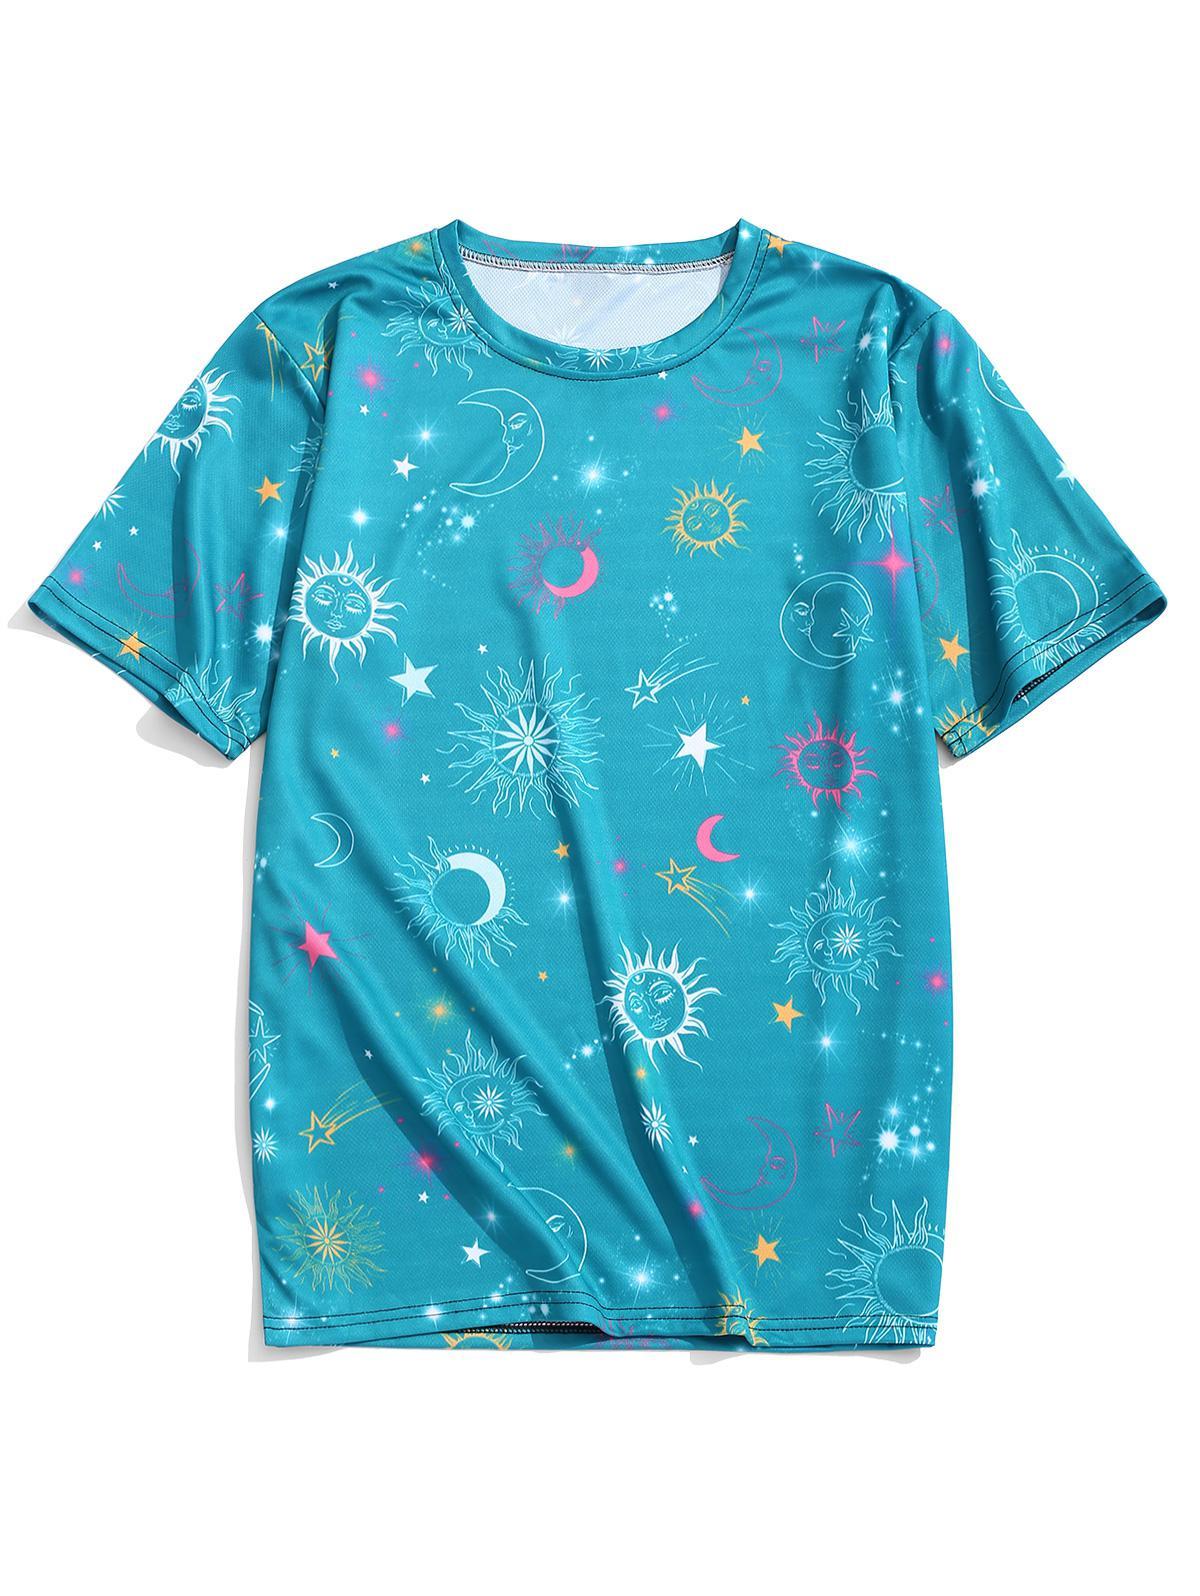 Sun Moon Star Graphic Print Short Sleeves T-shirt, Greenish blue